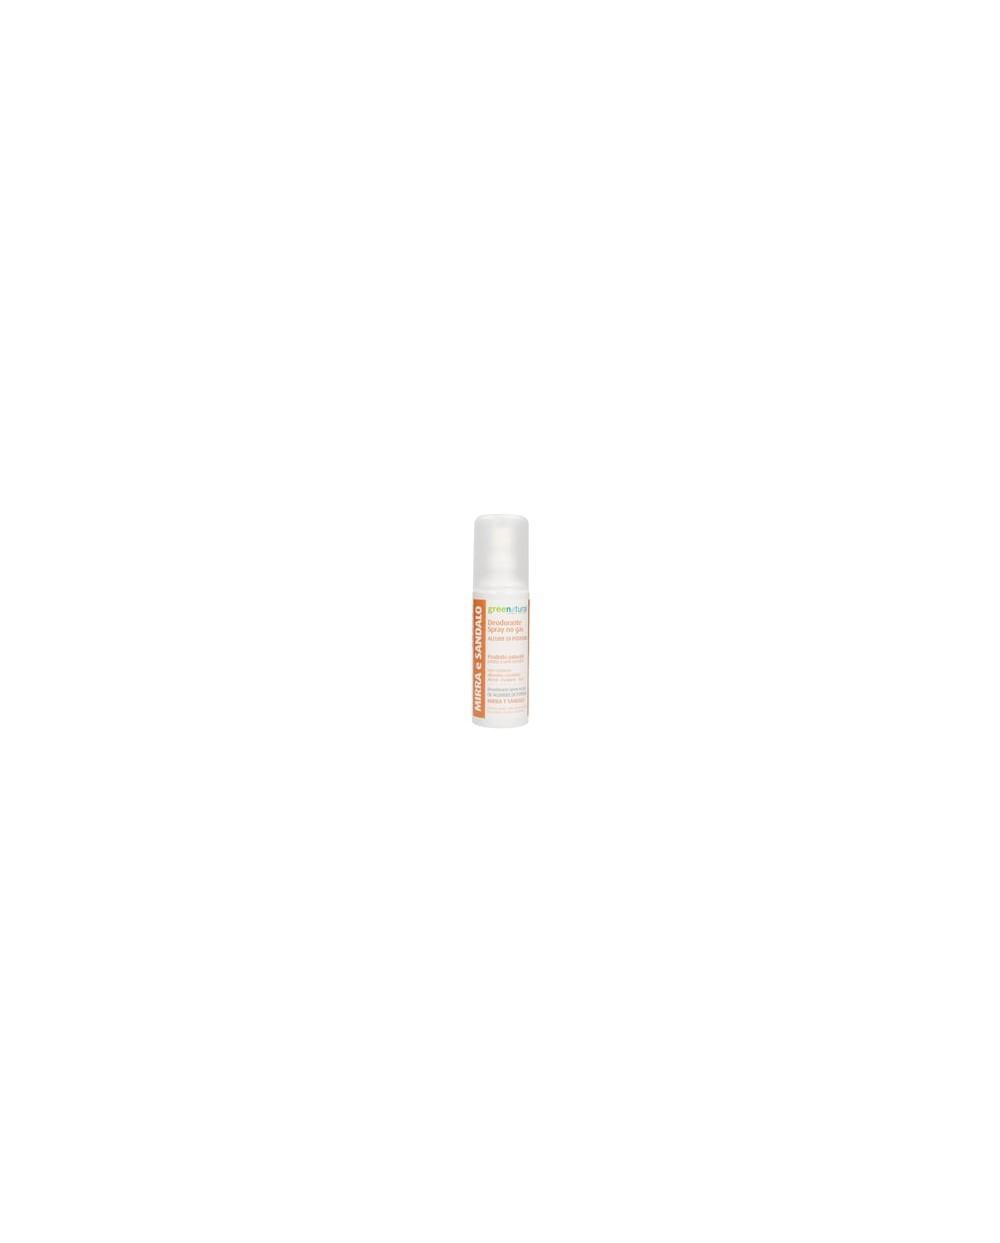 Greenatural - Deodorante Spray MIRRA e SANDALO